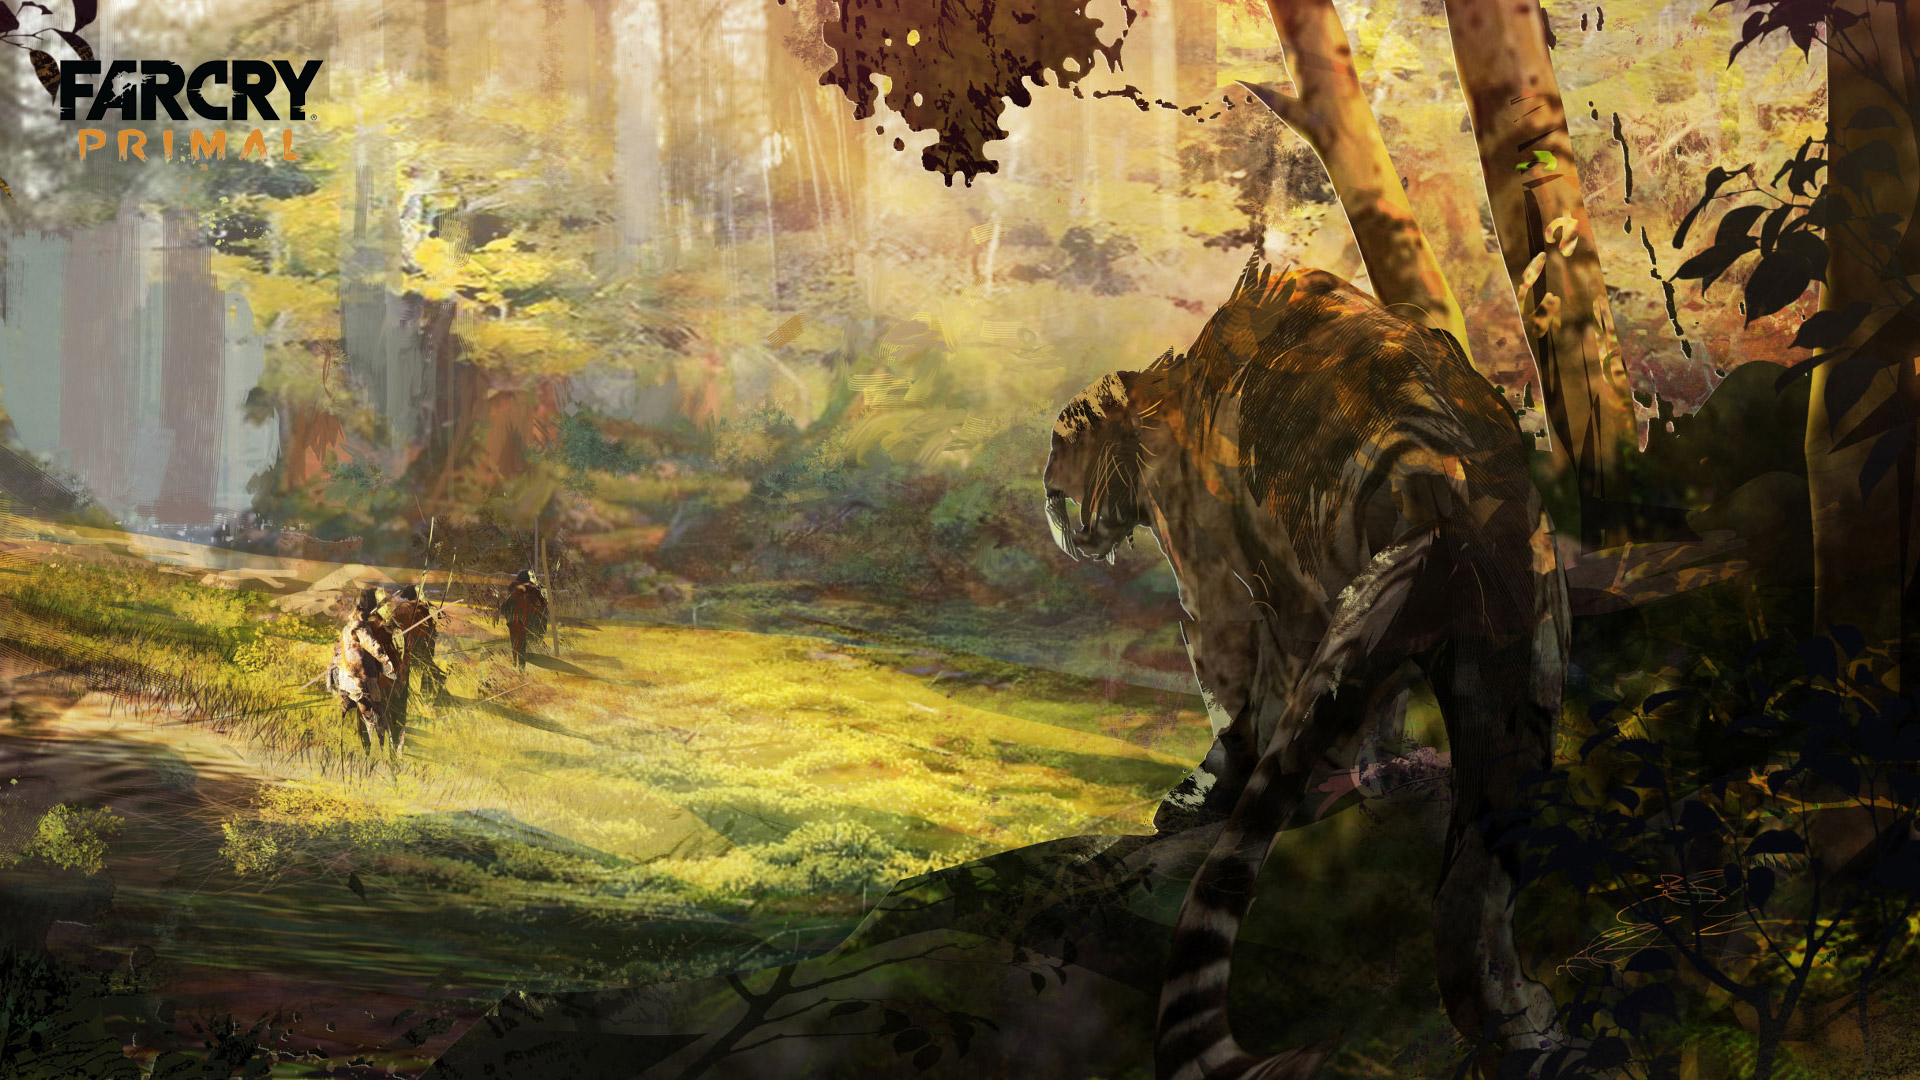 Free Far Cry Primal Wallpaper in 1920x1080